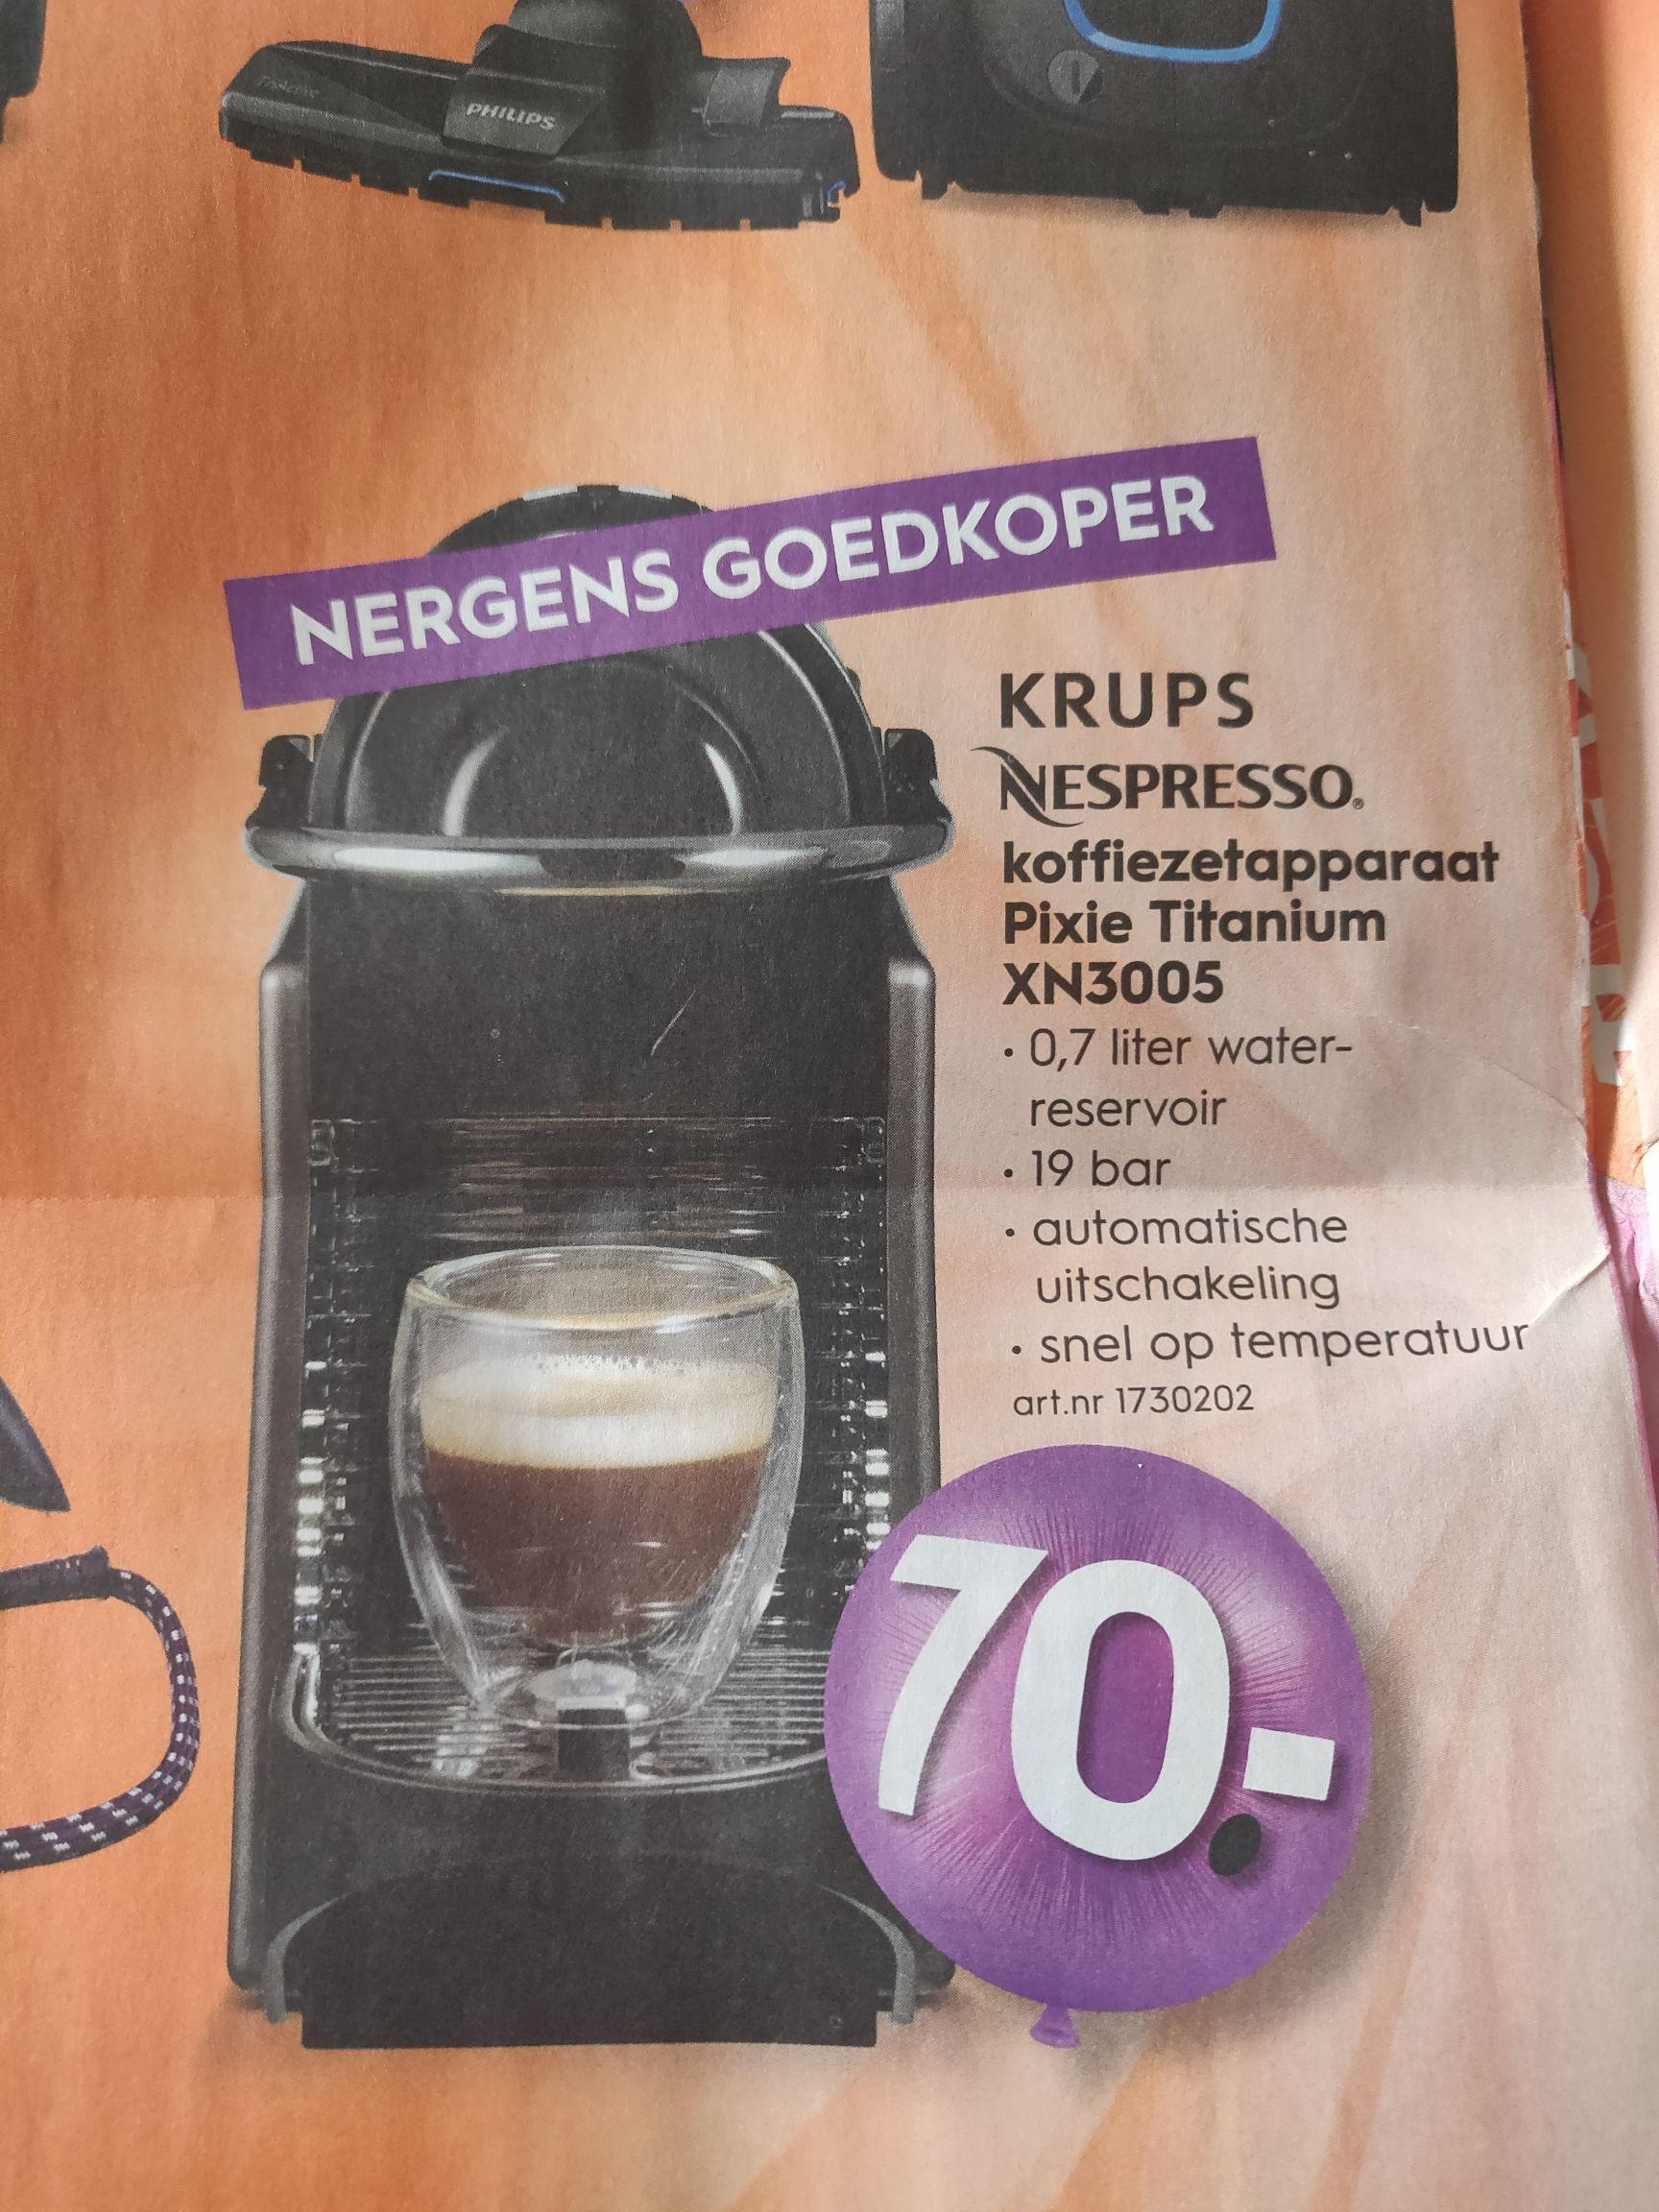 [BLOKKER] Nespresso koffiezetapparaat Pixie Titanium XN3005